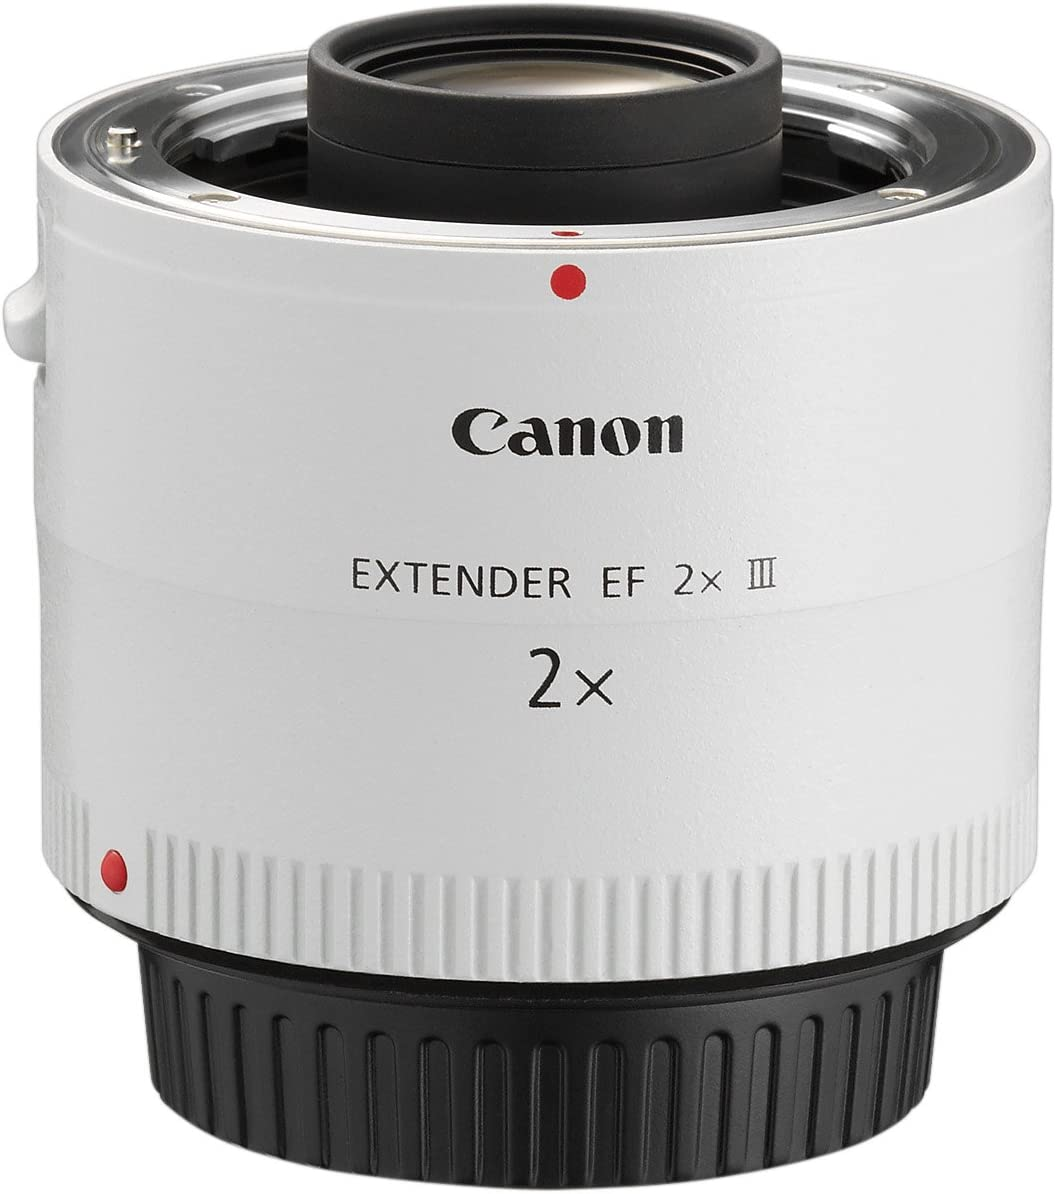 Canon Extender Ef 2X ii International Version (No Warranty)